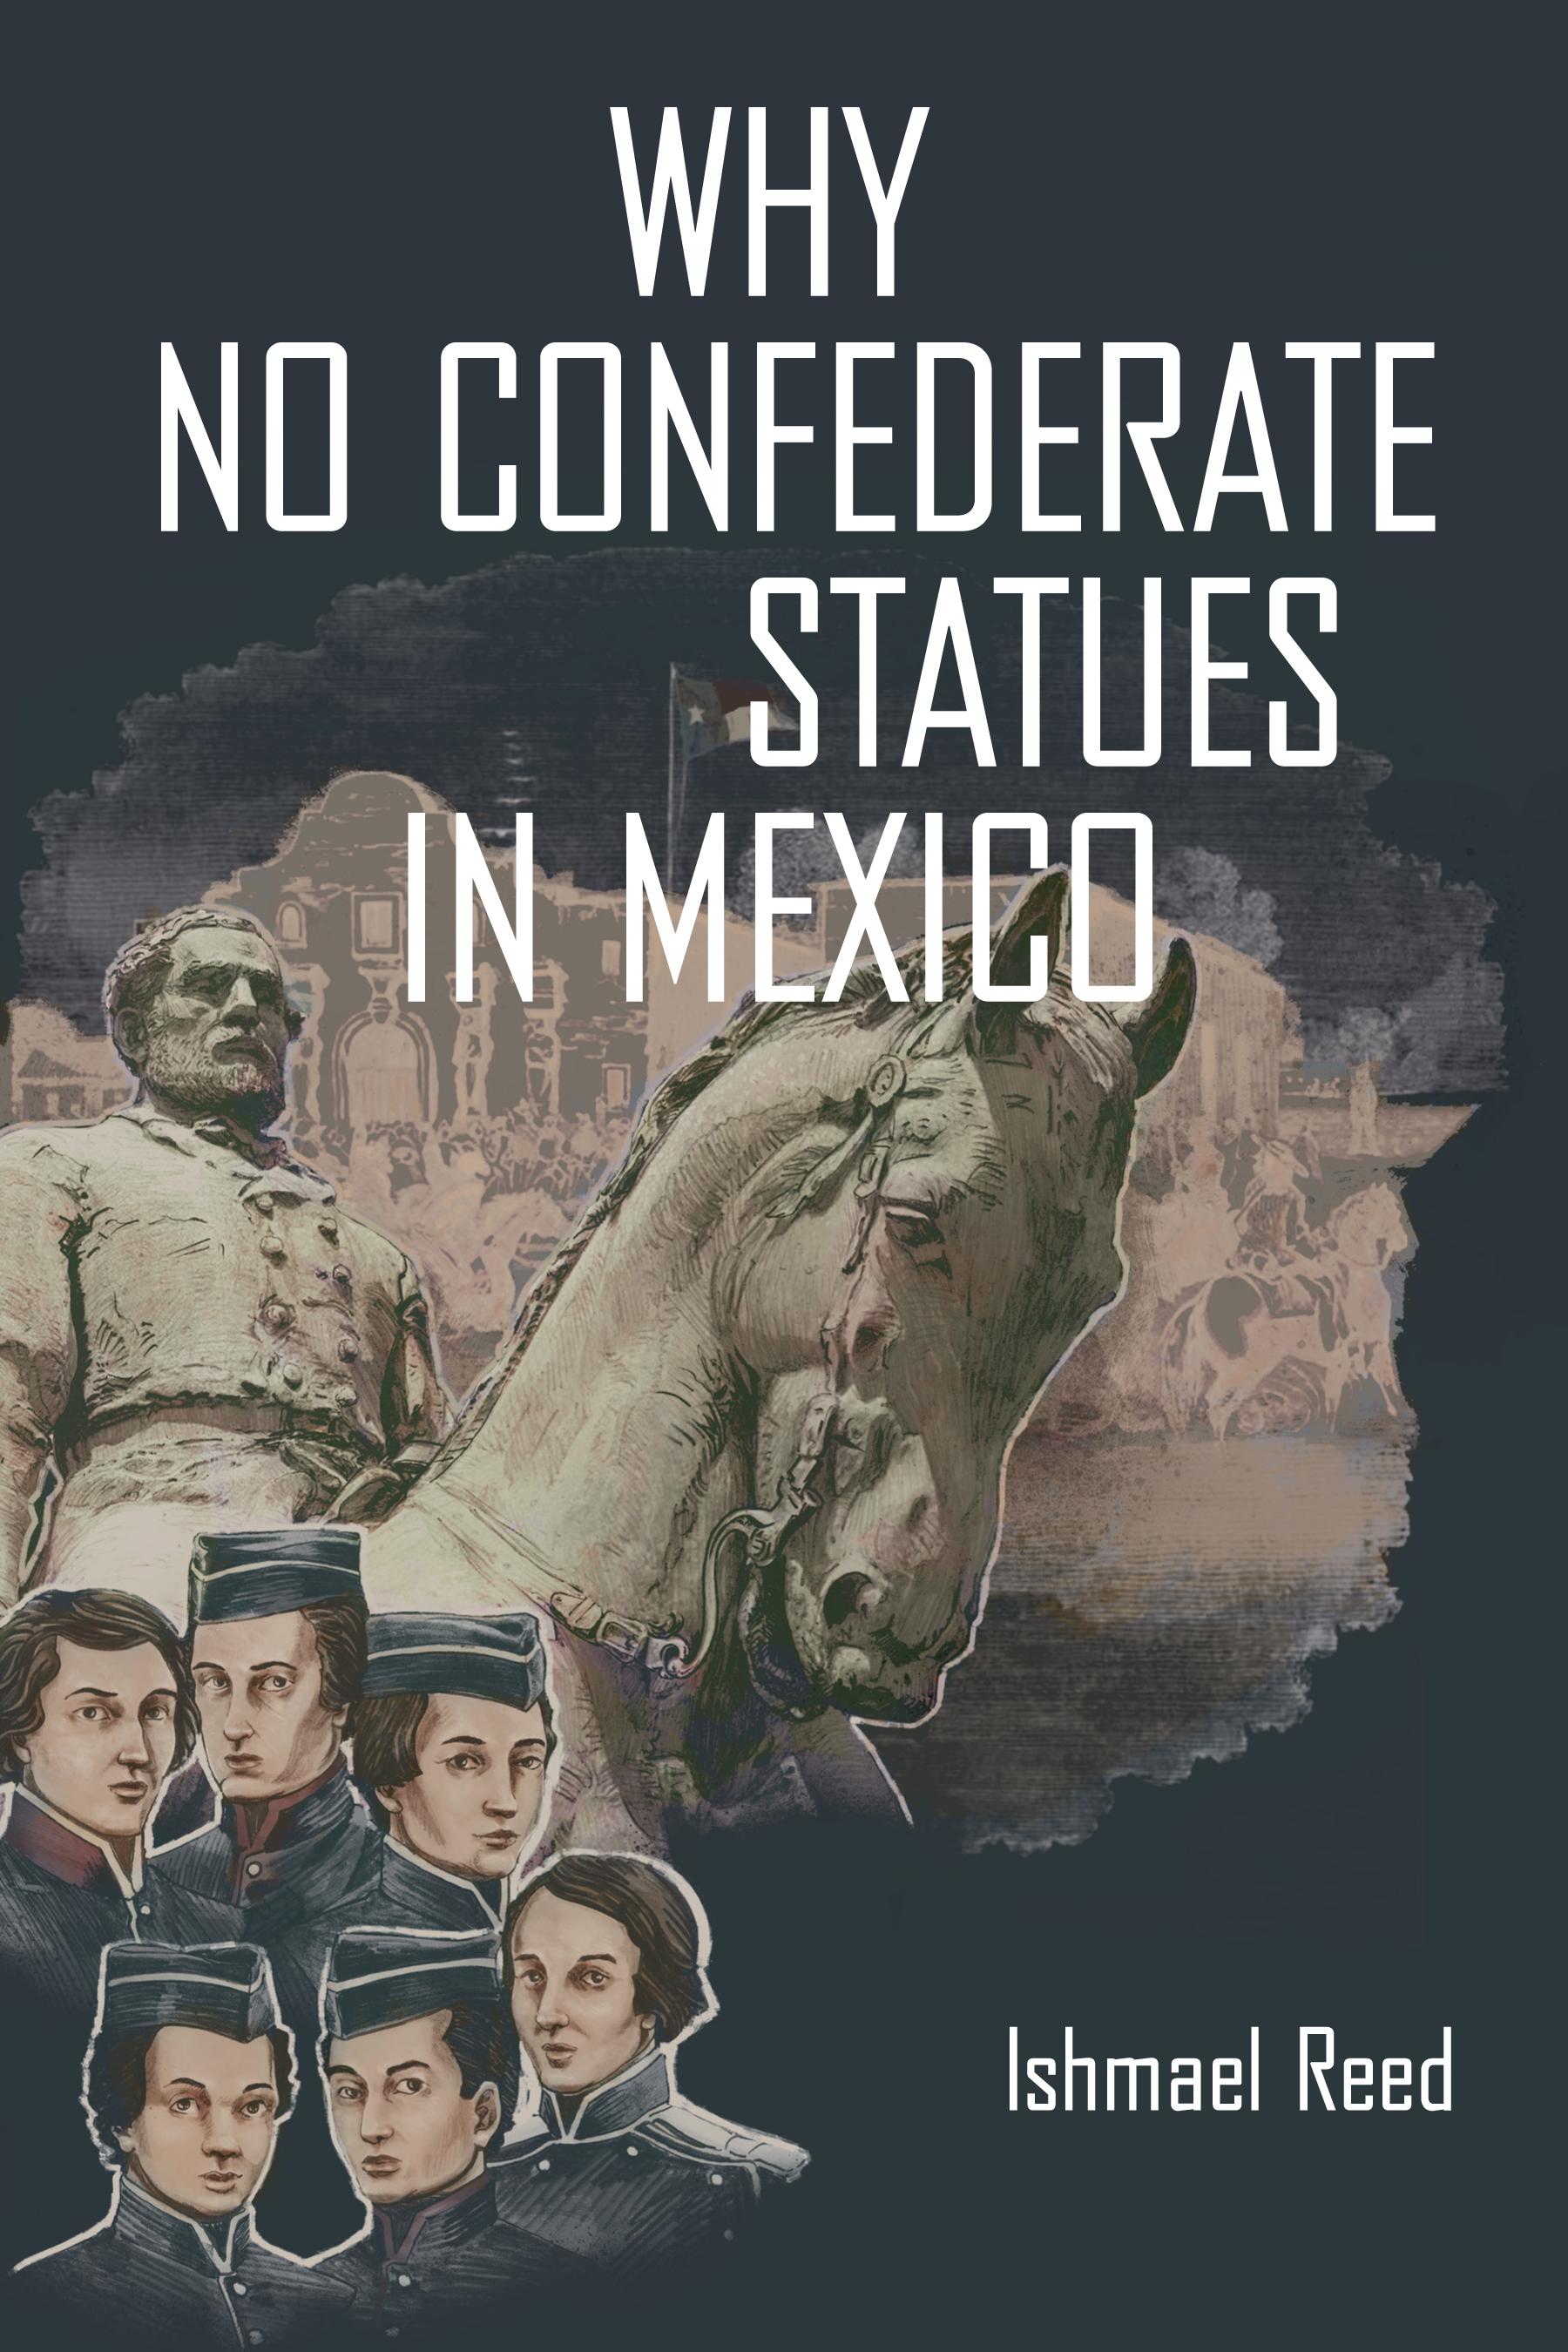 Why No Confederate Statues in Mexico - Baraka Books